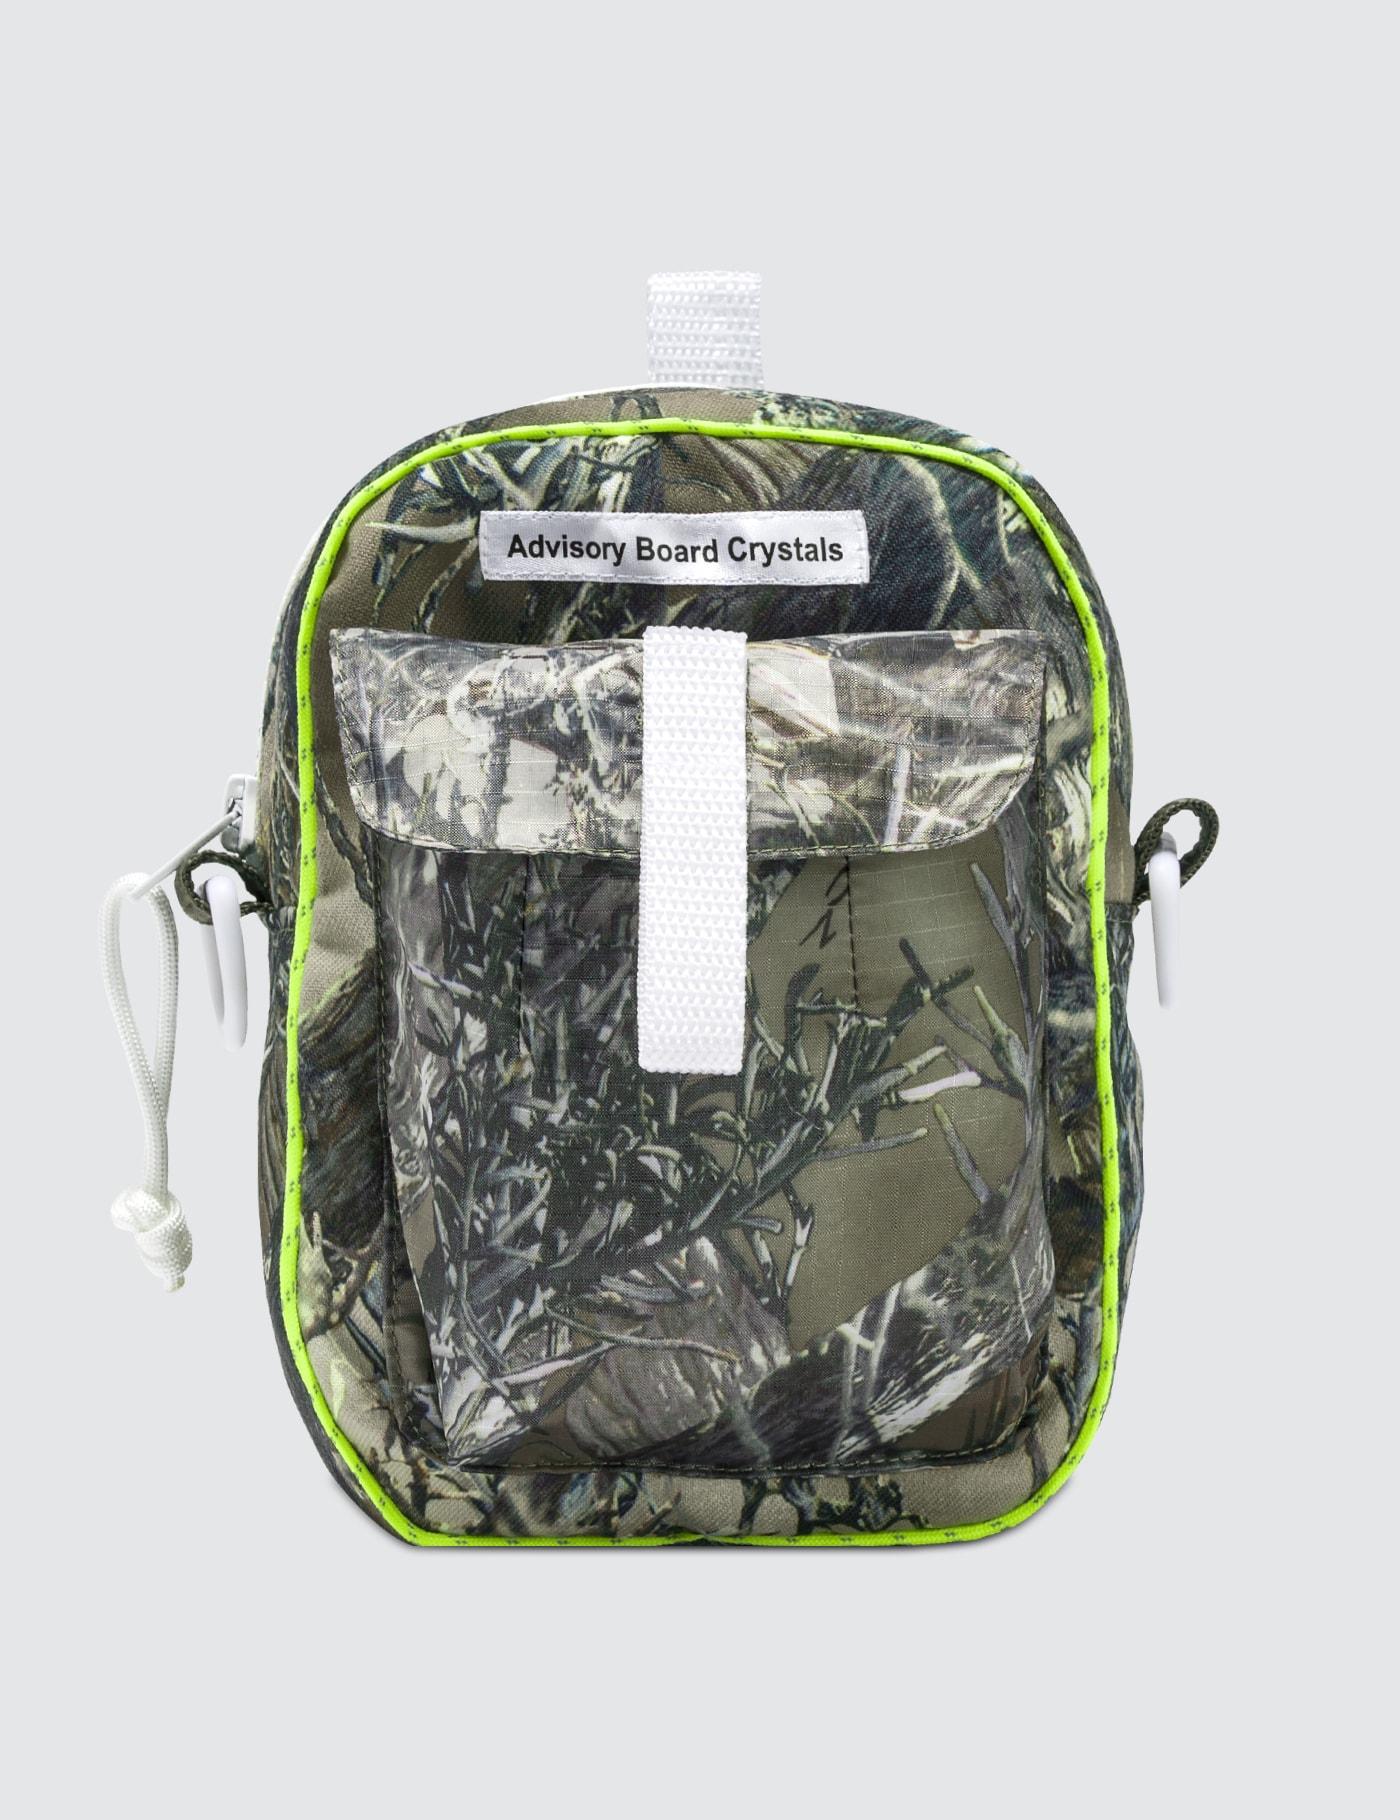 AdvisoryBoardCrystals手袋FREE